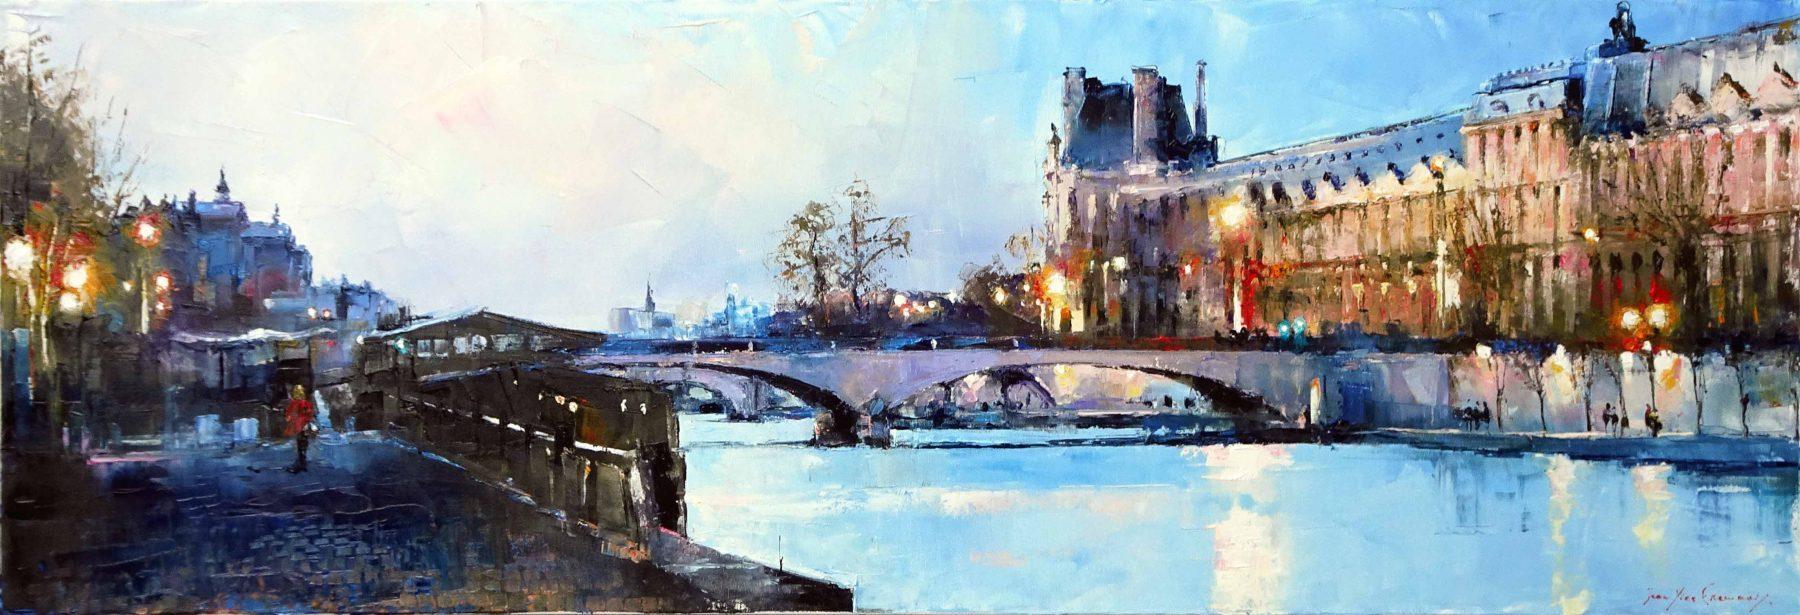 Paris, quand le Louvre s'illumine 120x40 2